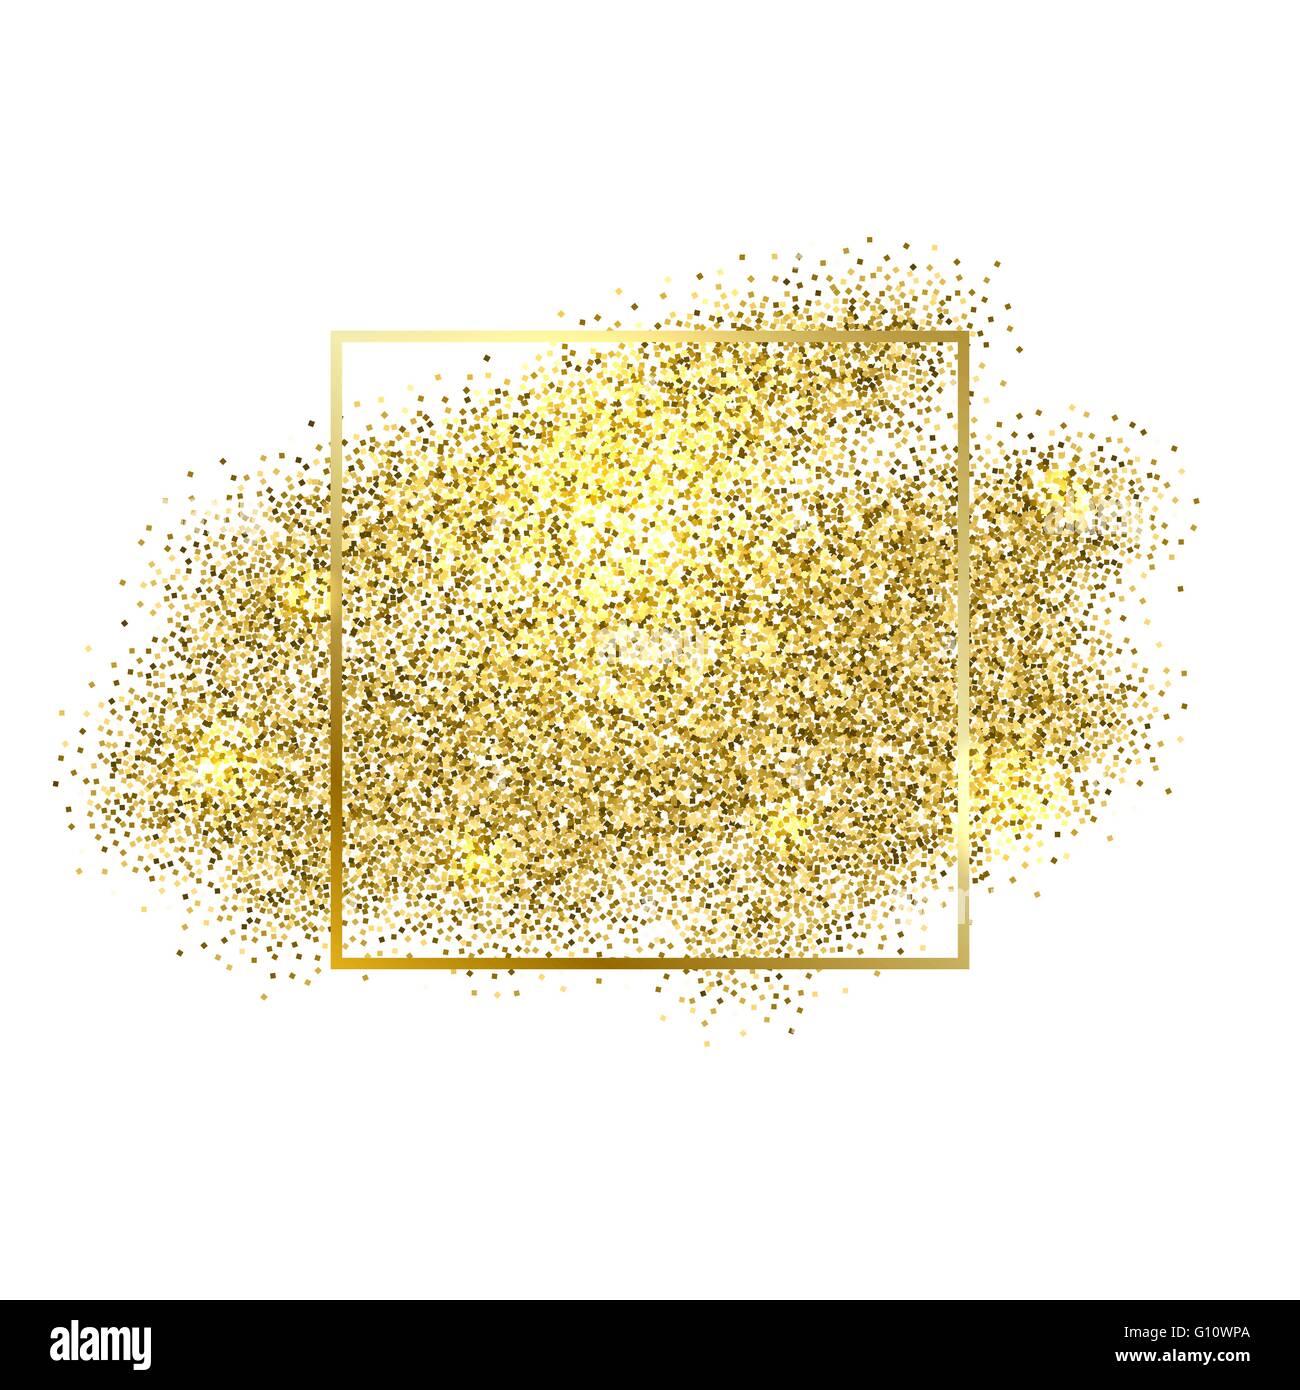 gold sparkles on white background gold glitter background